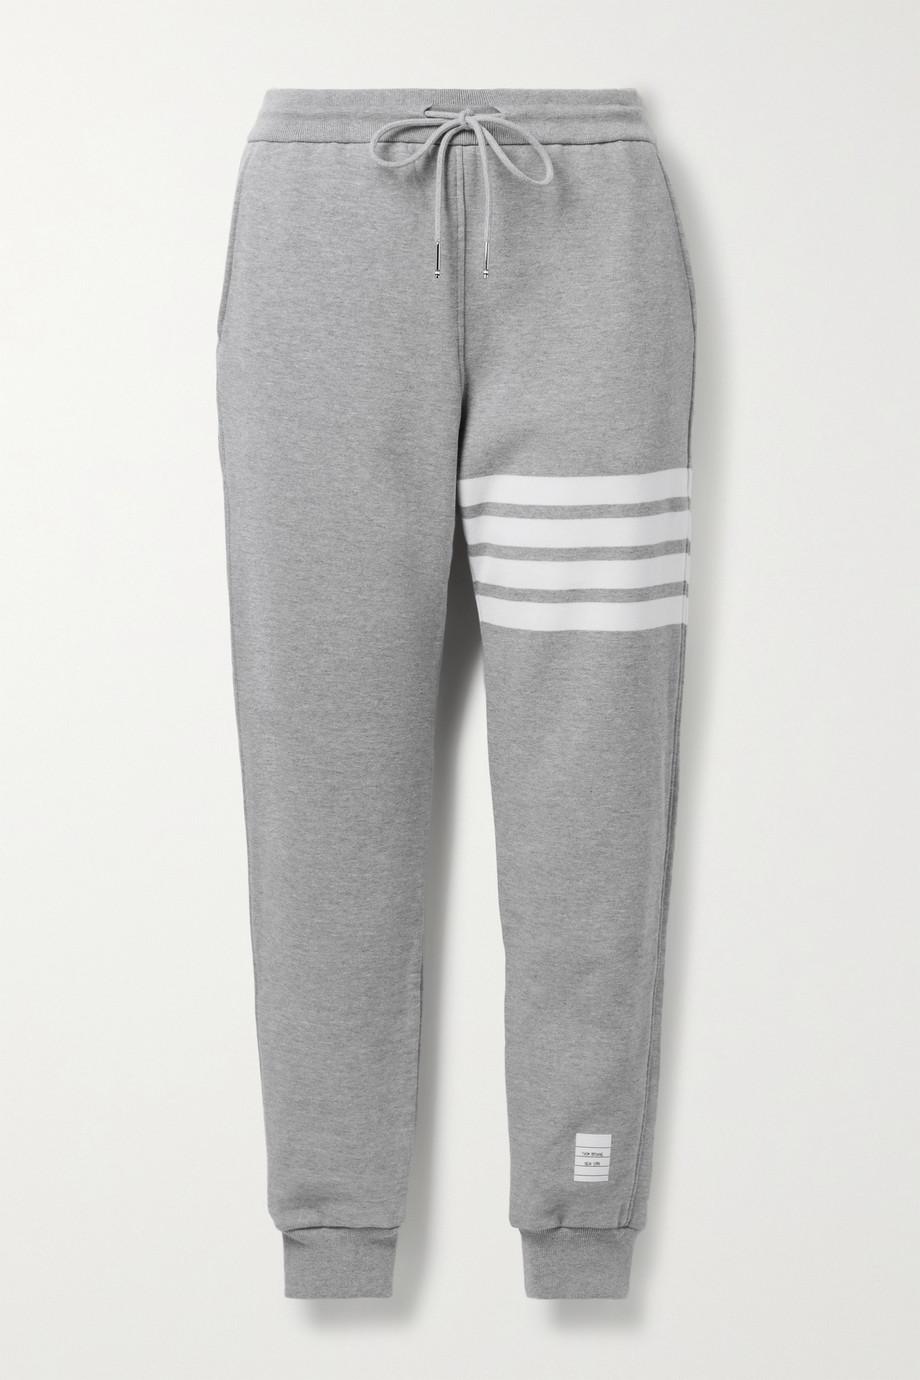 Thom Browne Striped mélange cotton-jersey track pants